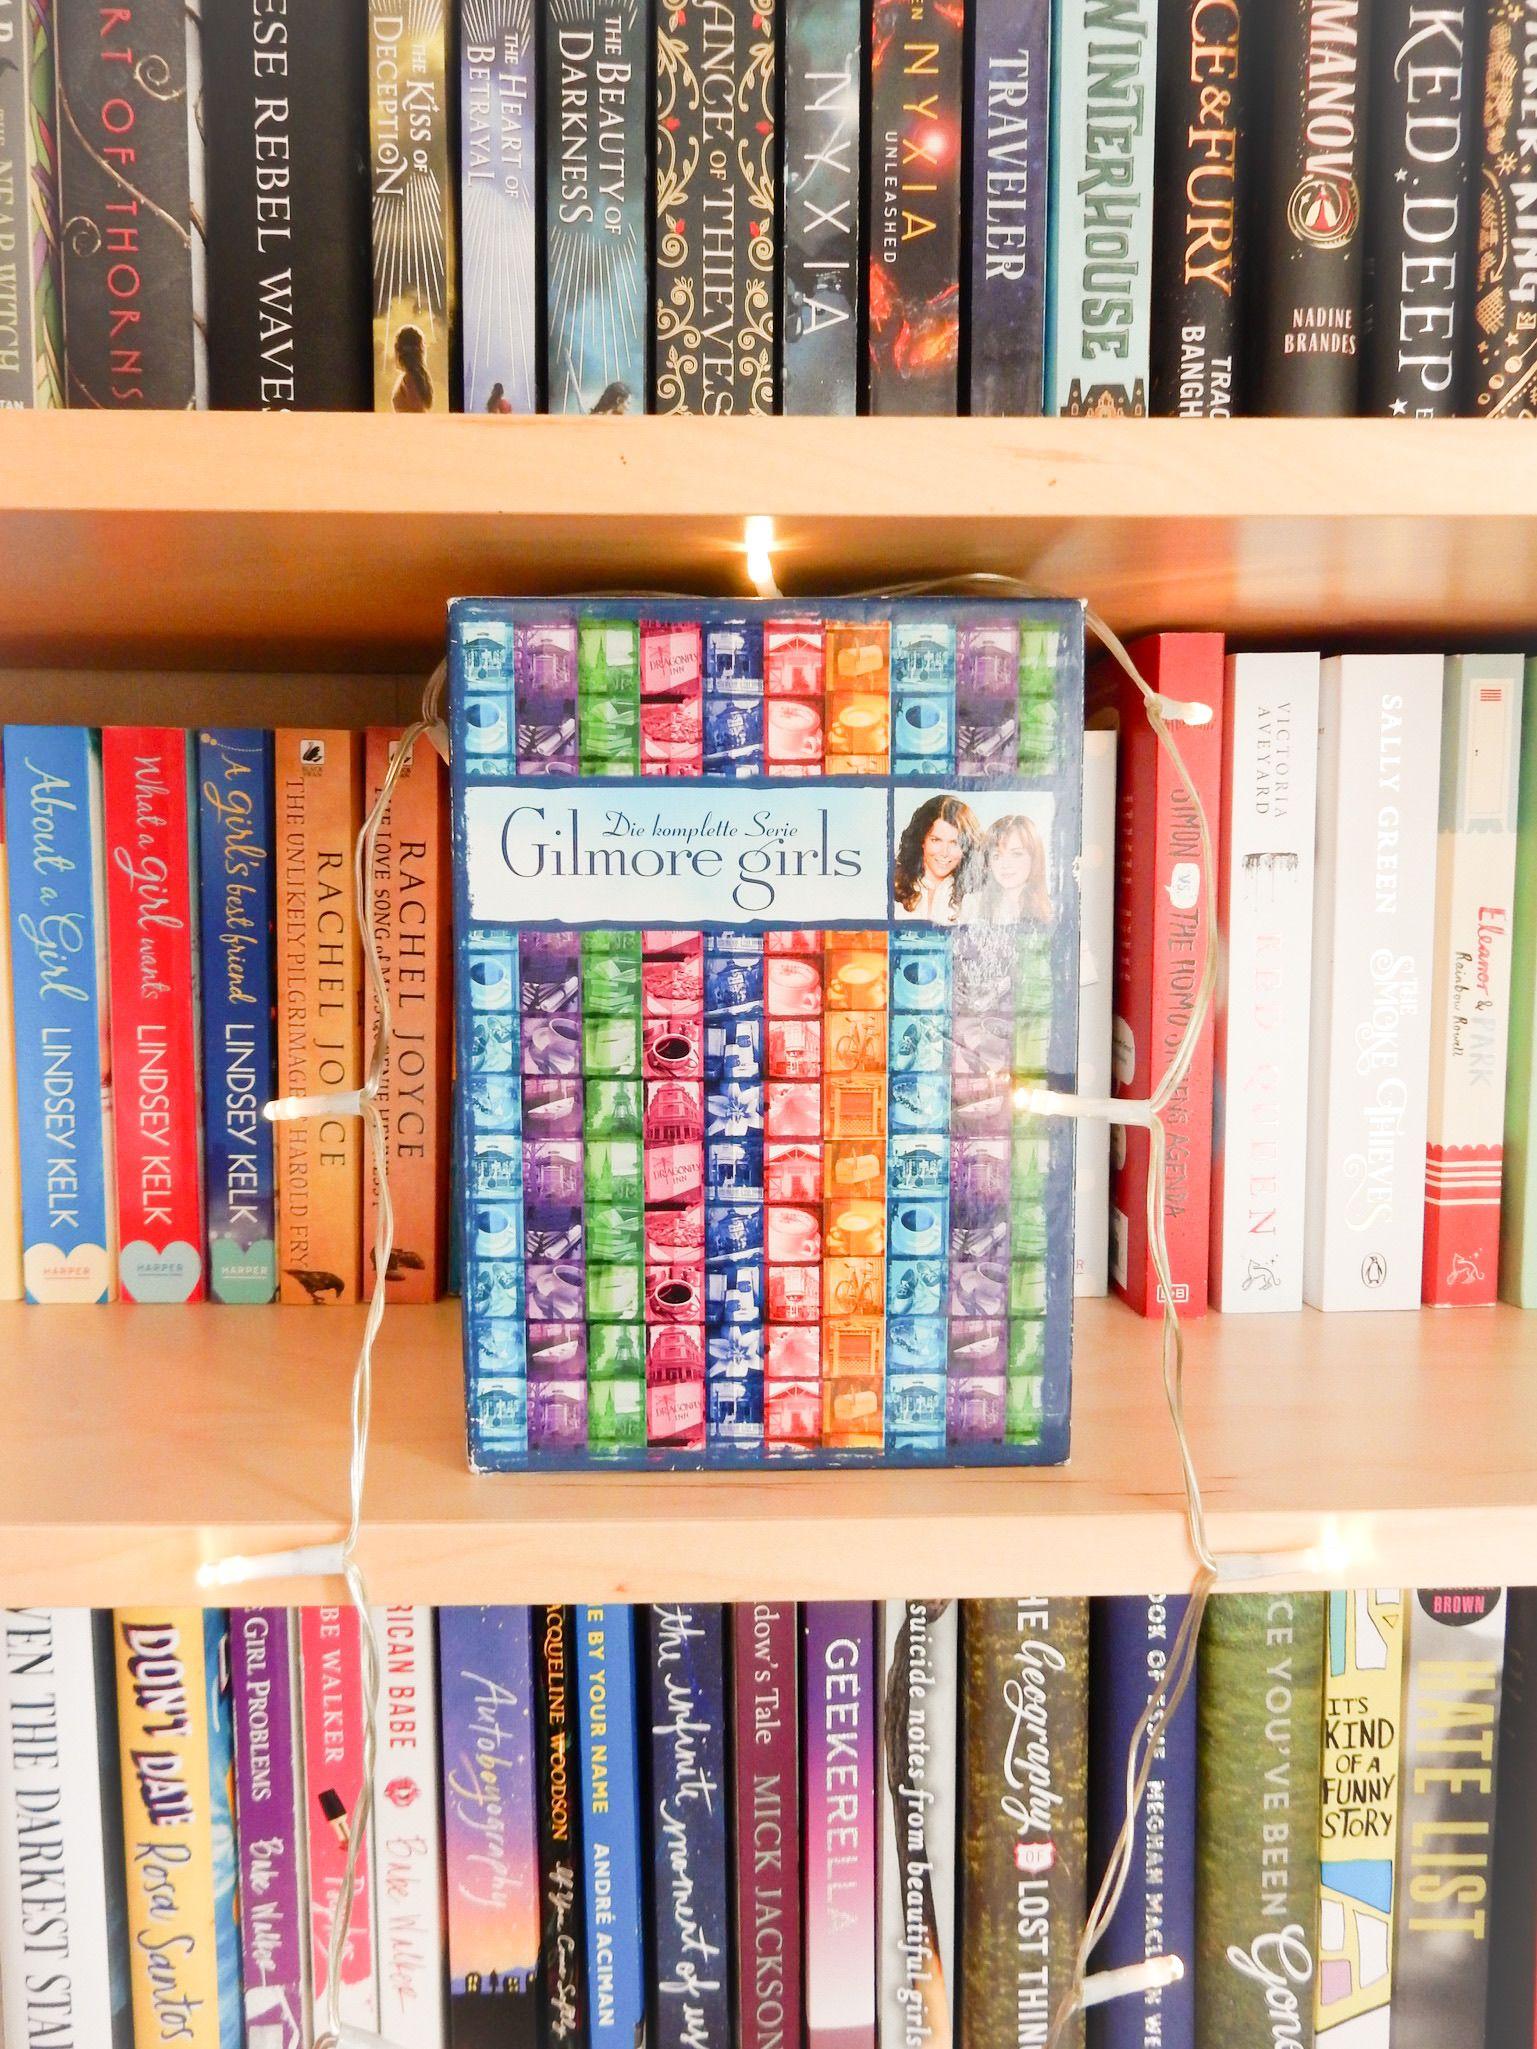 Gilmore Girls Serie Lauren Graham Alexis Blodel Bookshelf Stars Hollow Star Wars Einfach